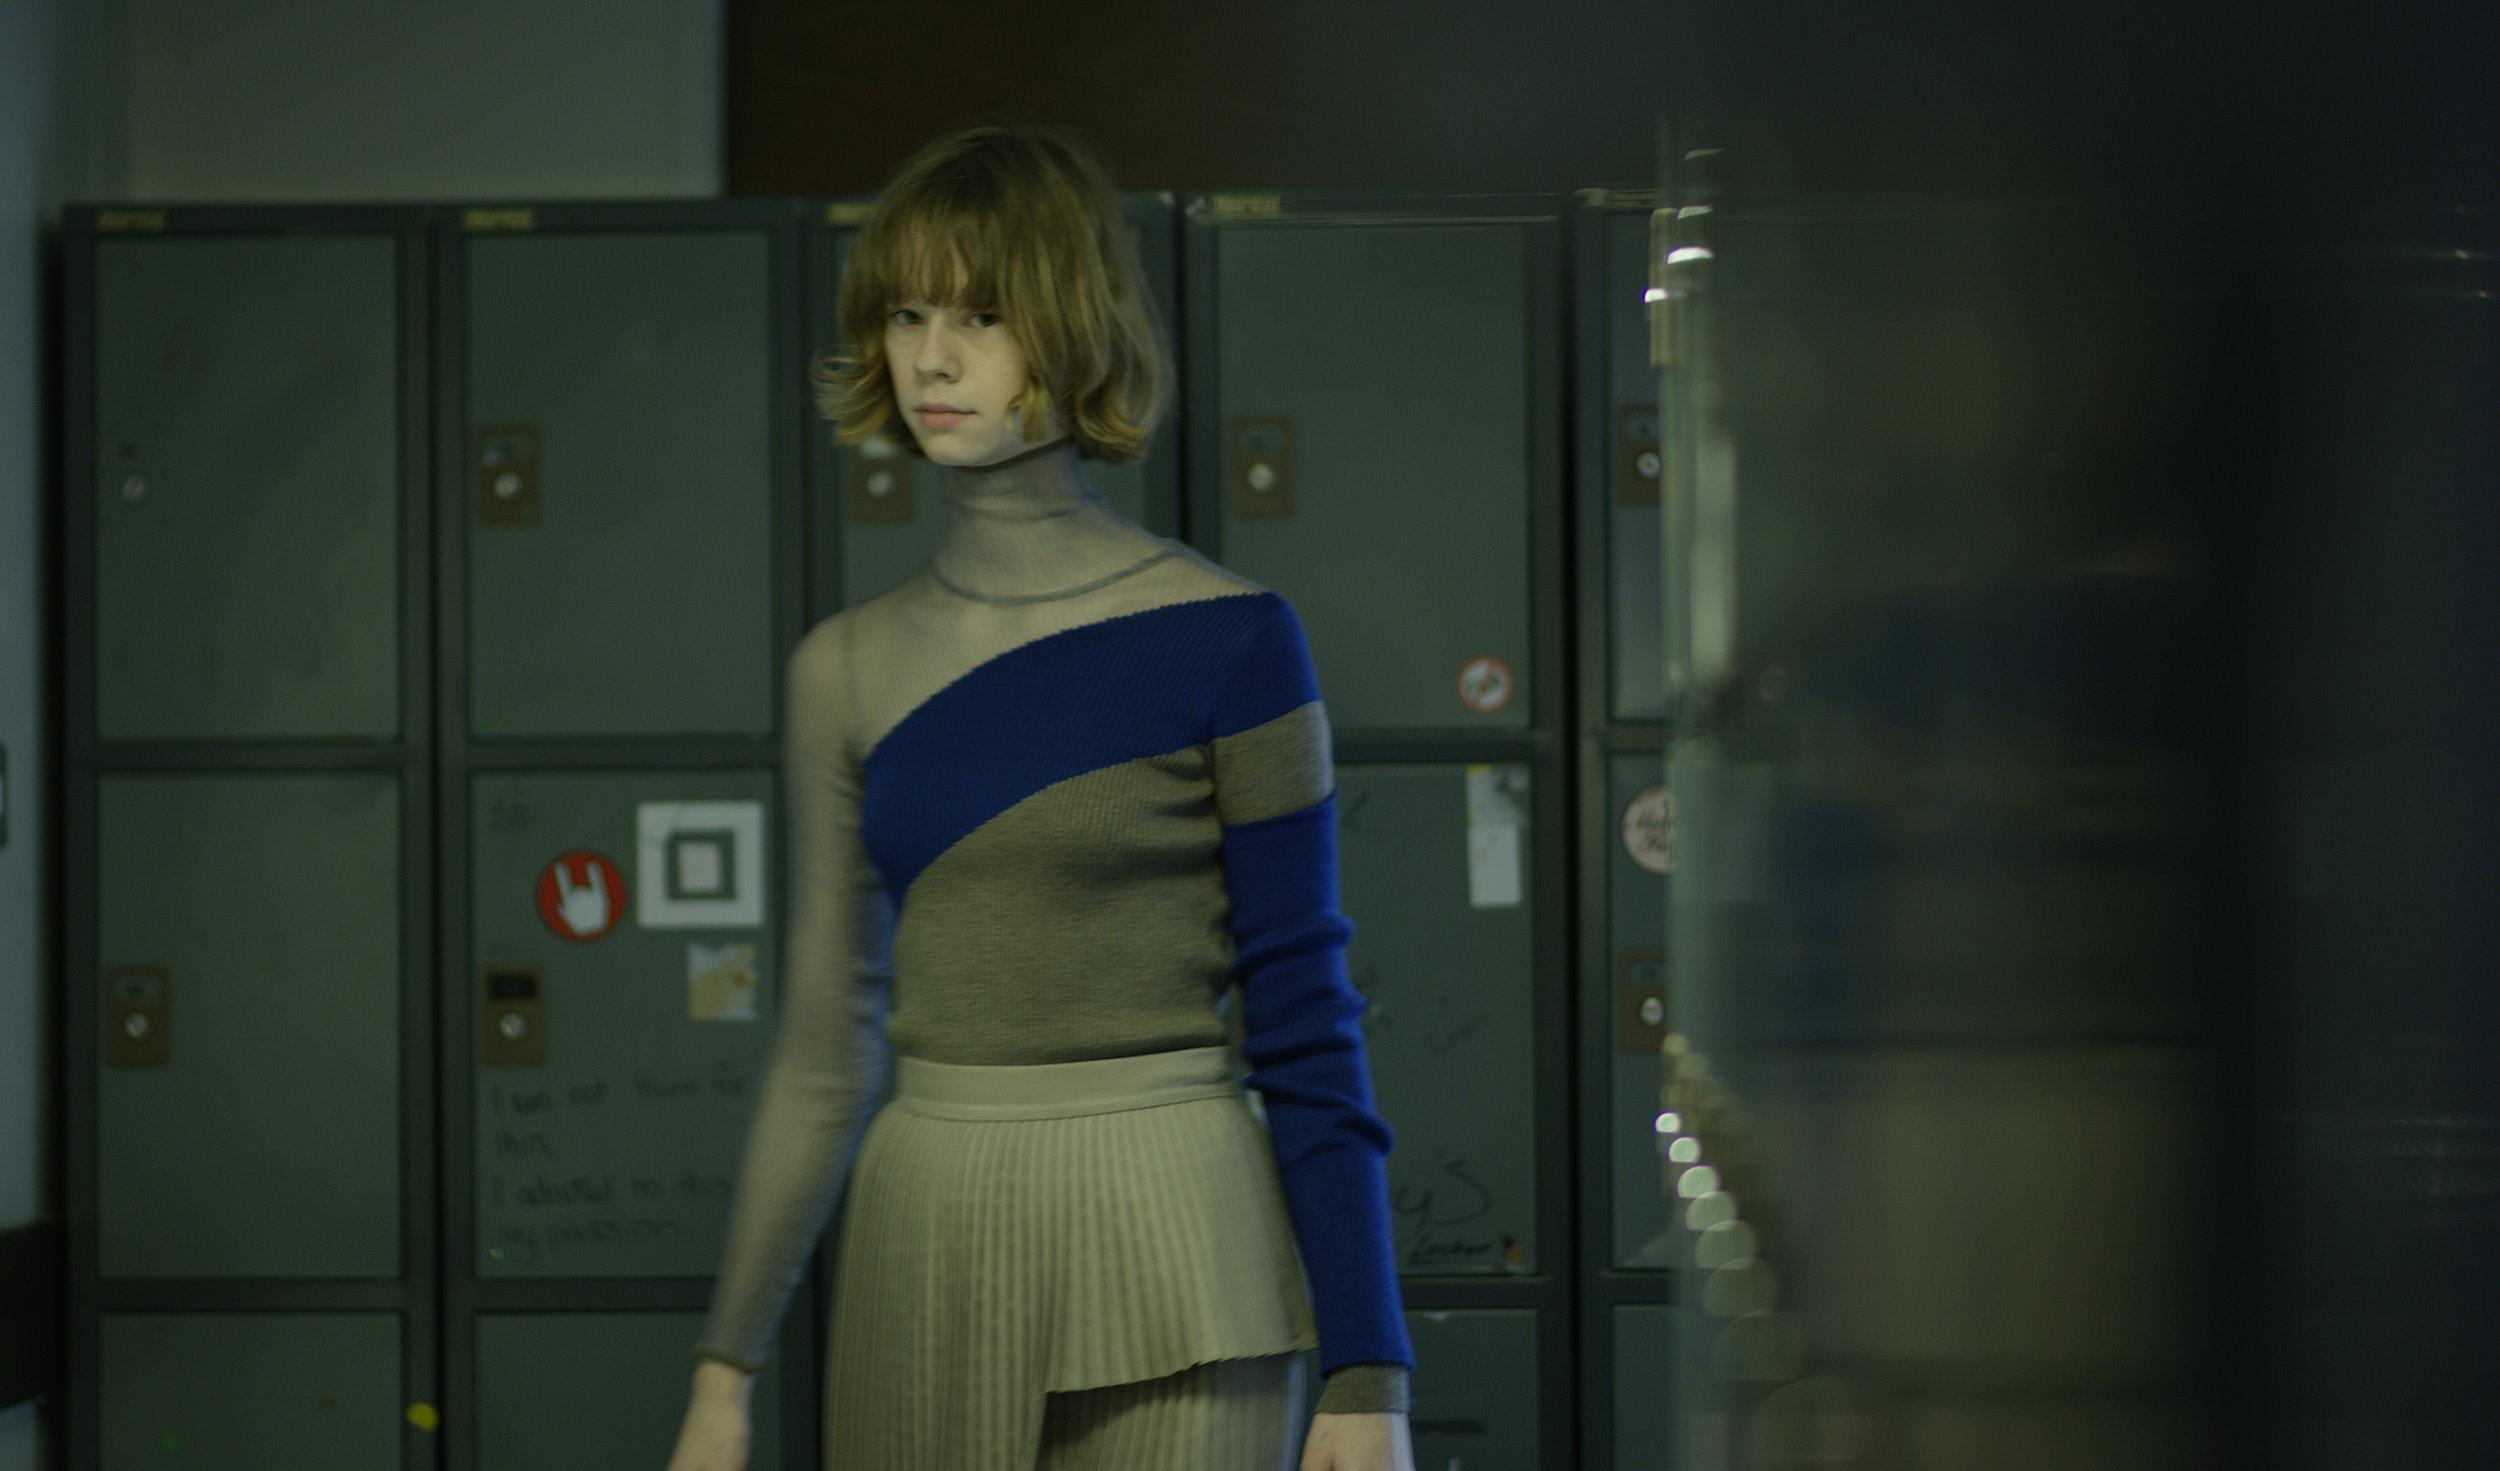 rokh_aw17_fashion_collection_magazine_17.jpg